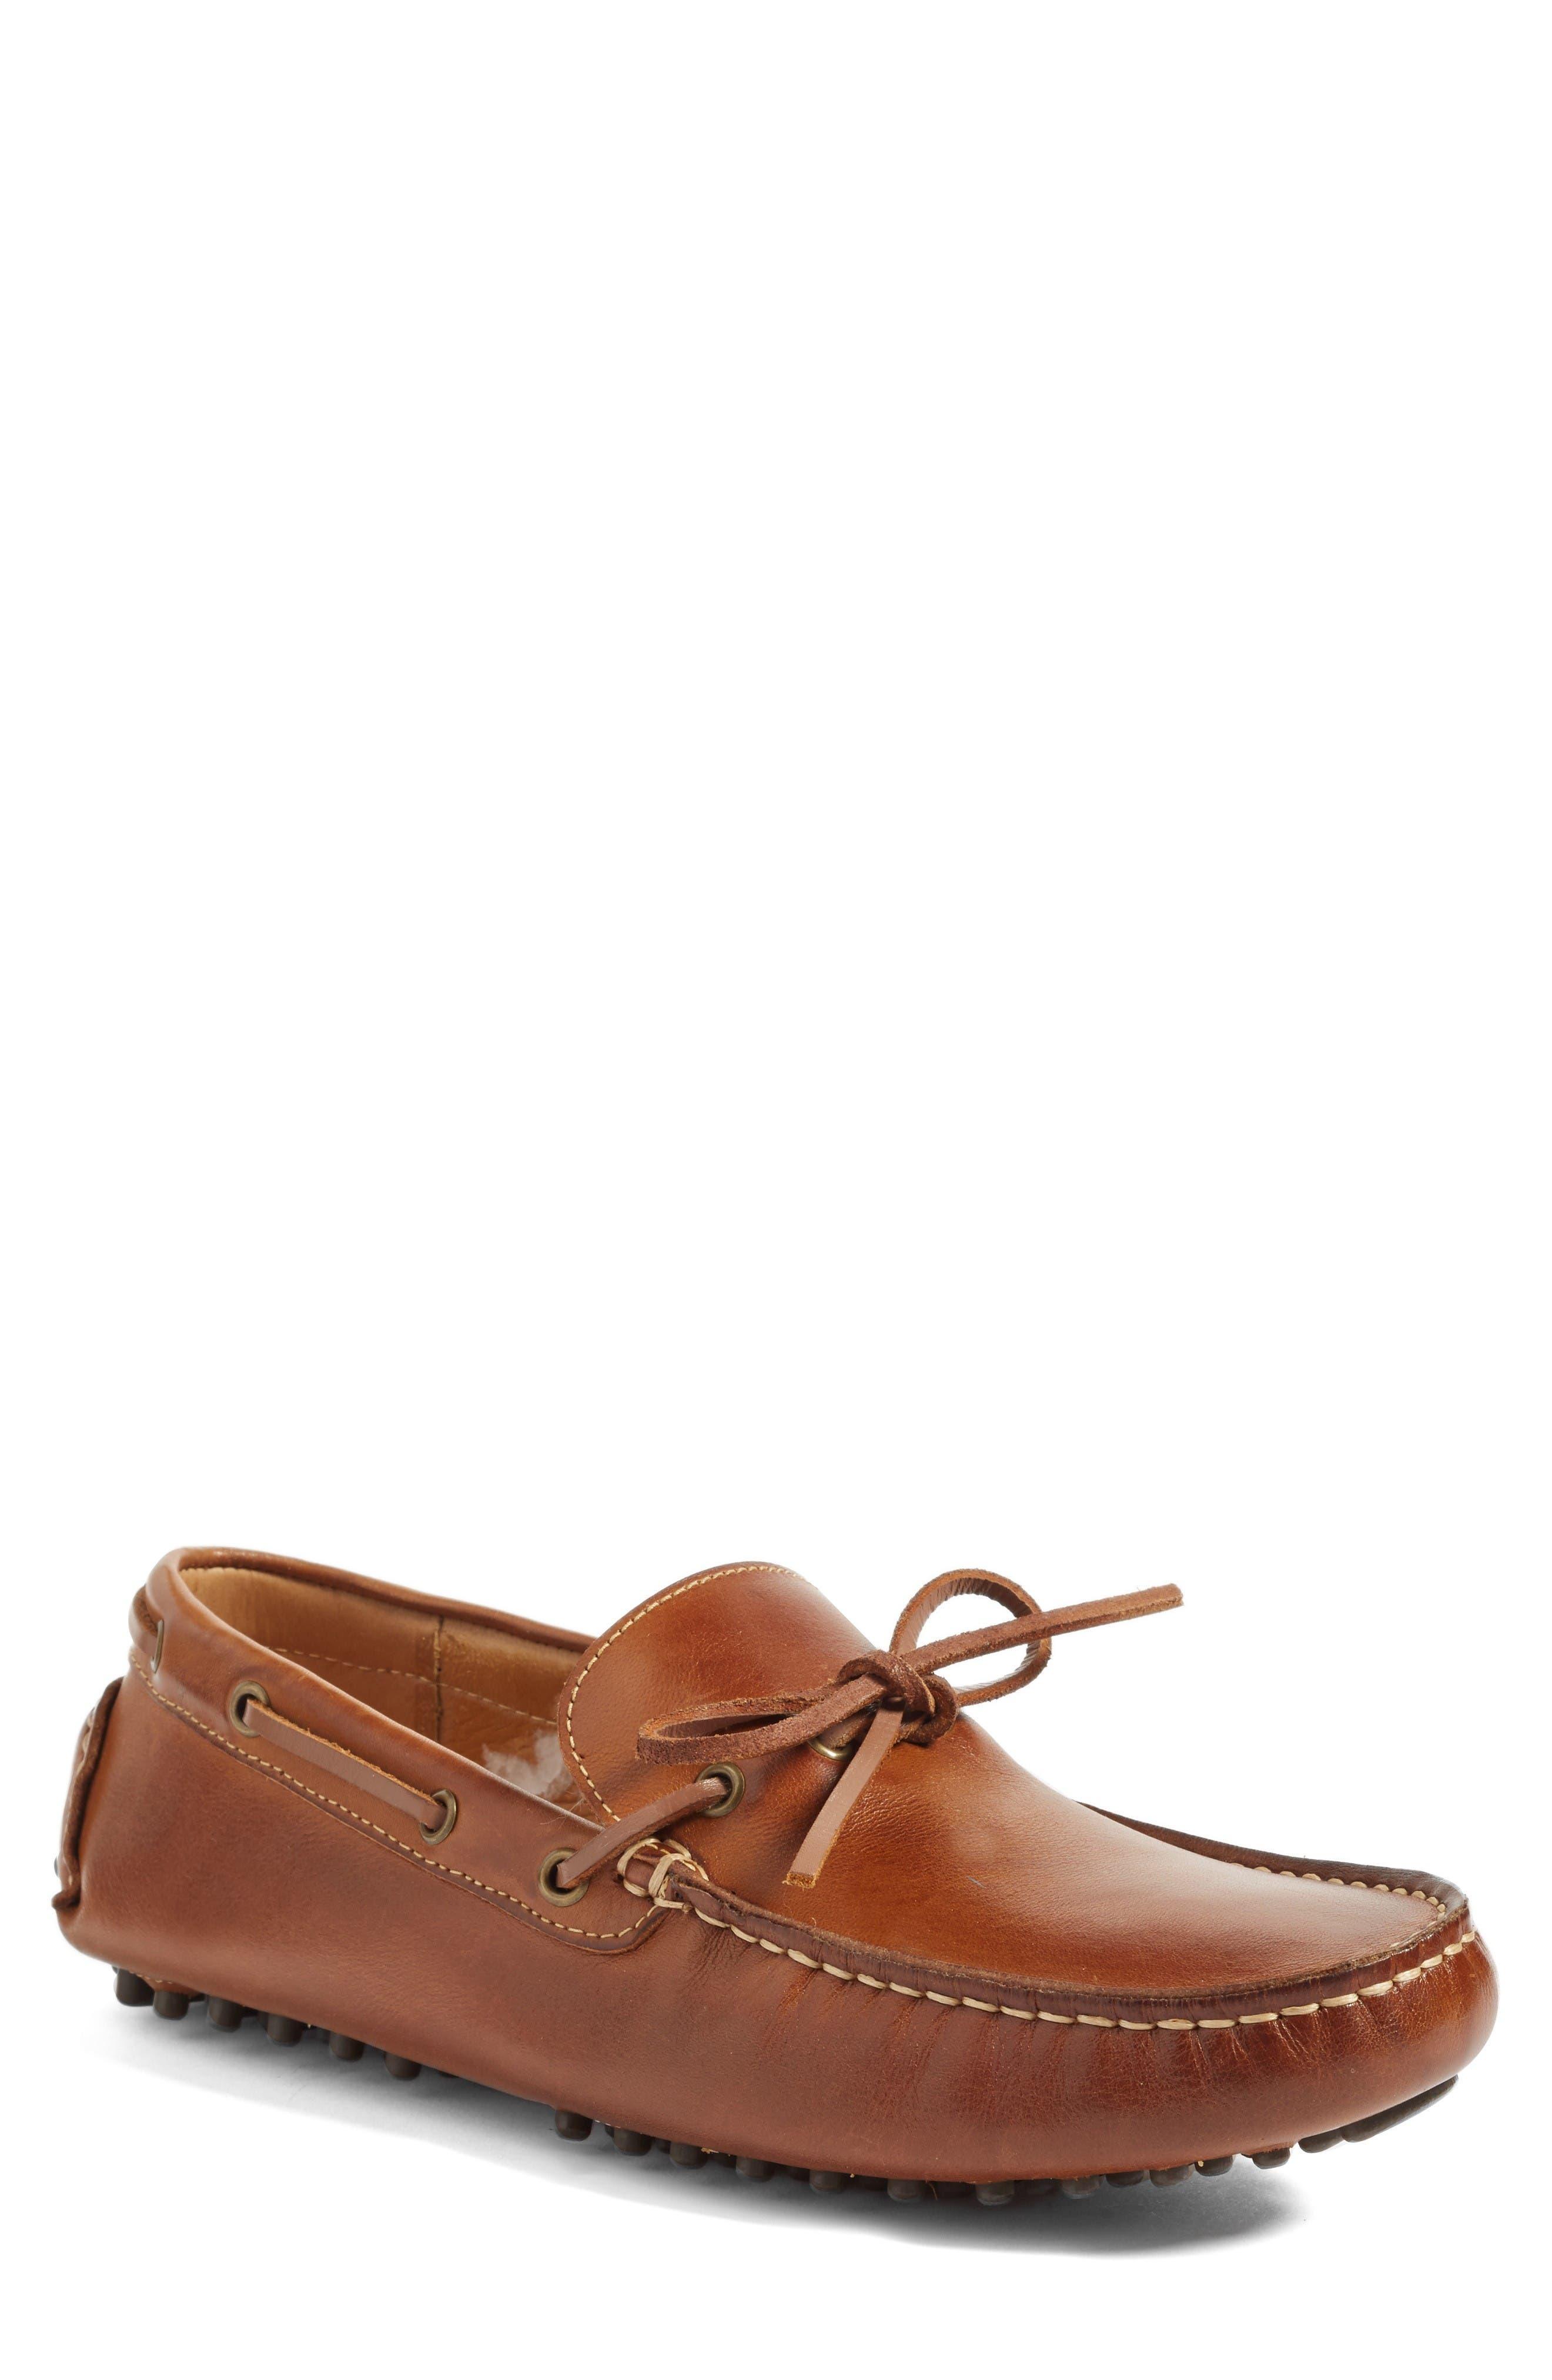 JOHN W. NORDSTROM® Midland Driving Shoe